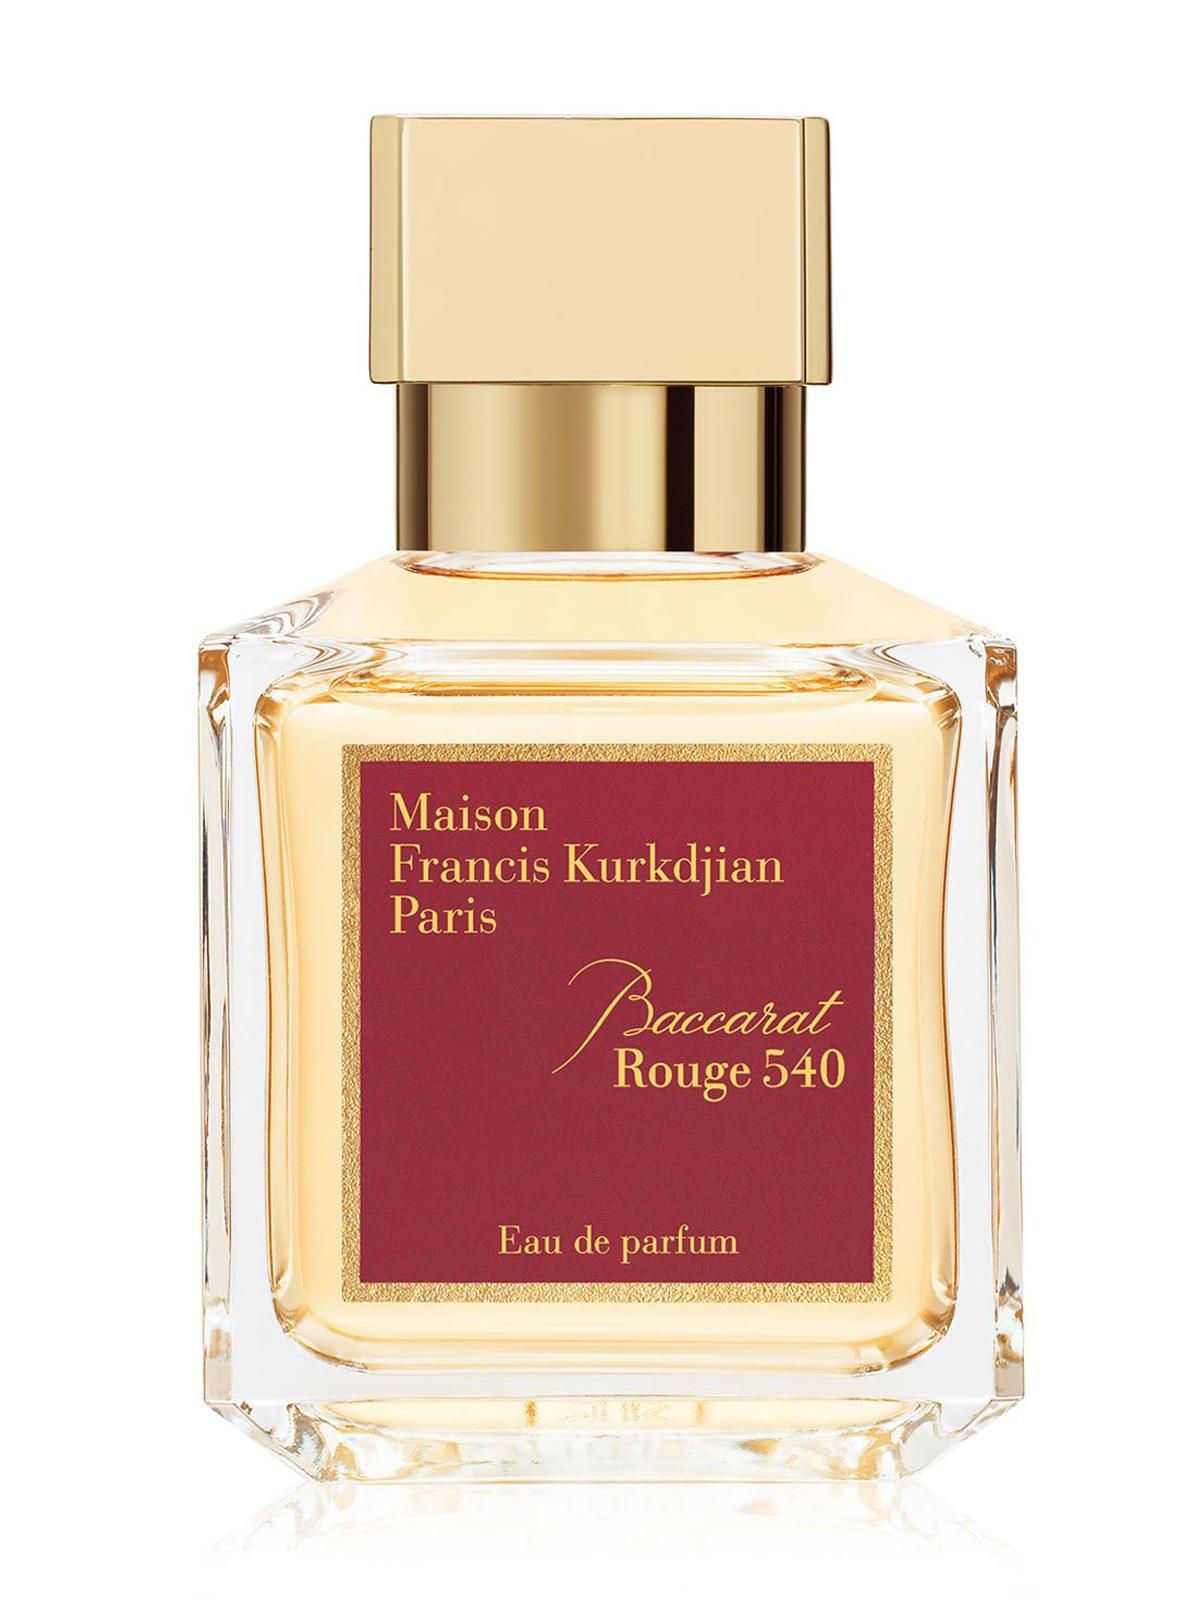 Francis Kurkdjian Baccarat Rouge 540 For Unisex Eau De Parfum 70ML